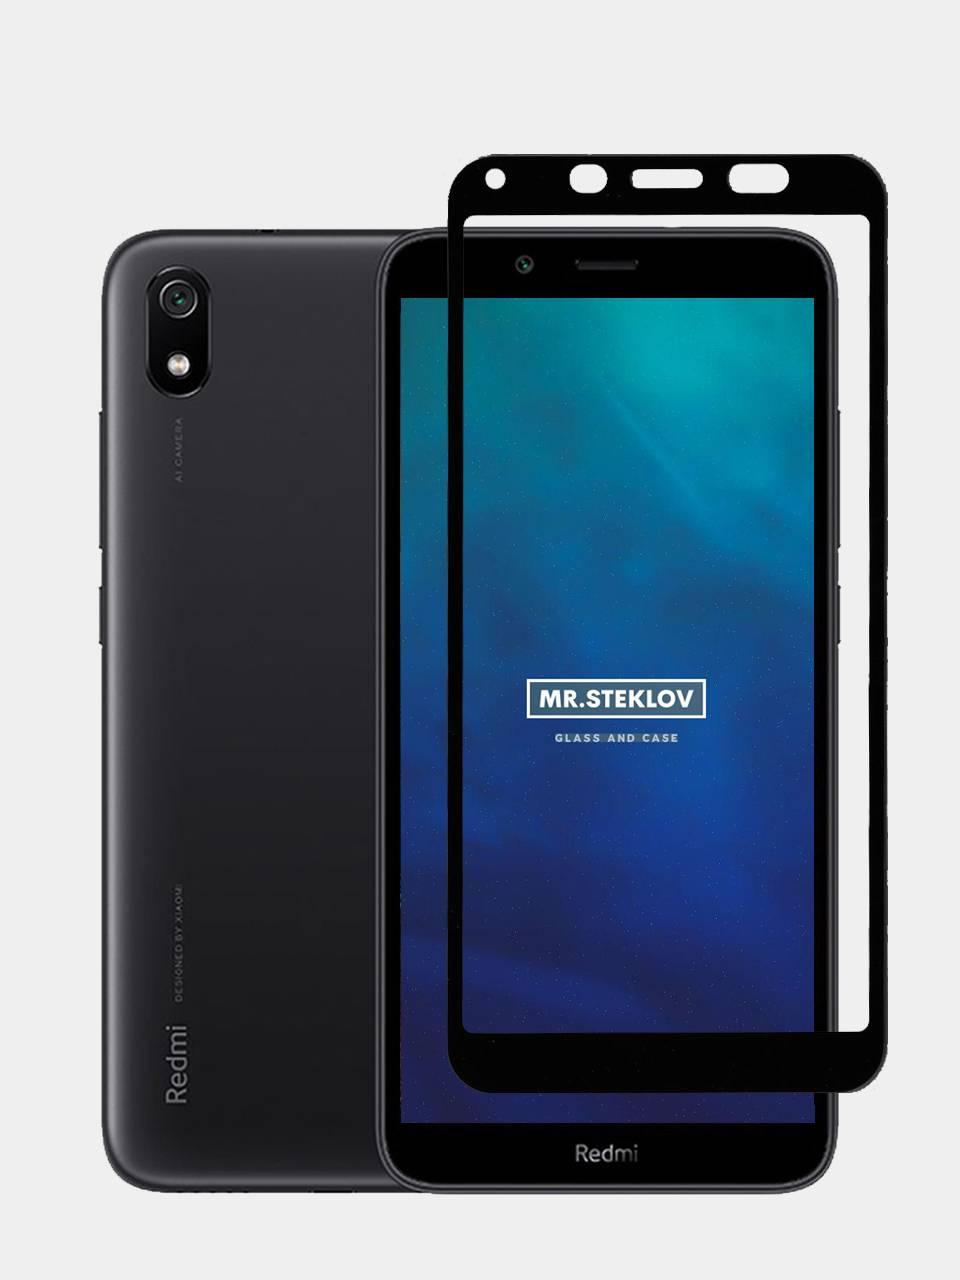 Защитное стекло 9D на Xiaomi redmi GO / 6A / 7A / 7А  черное / Redmi 8A / Redmi / 8 / редми8 редми 8а с доставкой за 1 день купить на KazanExpress